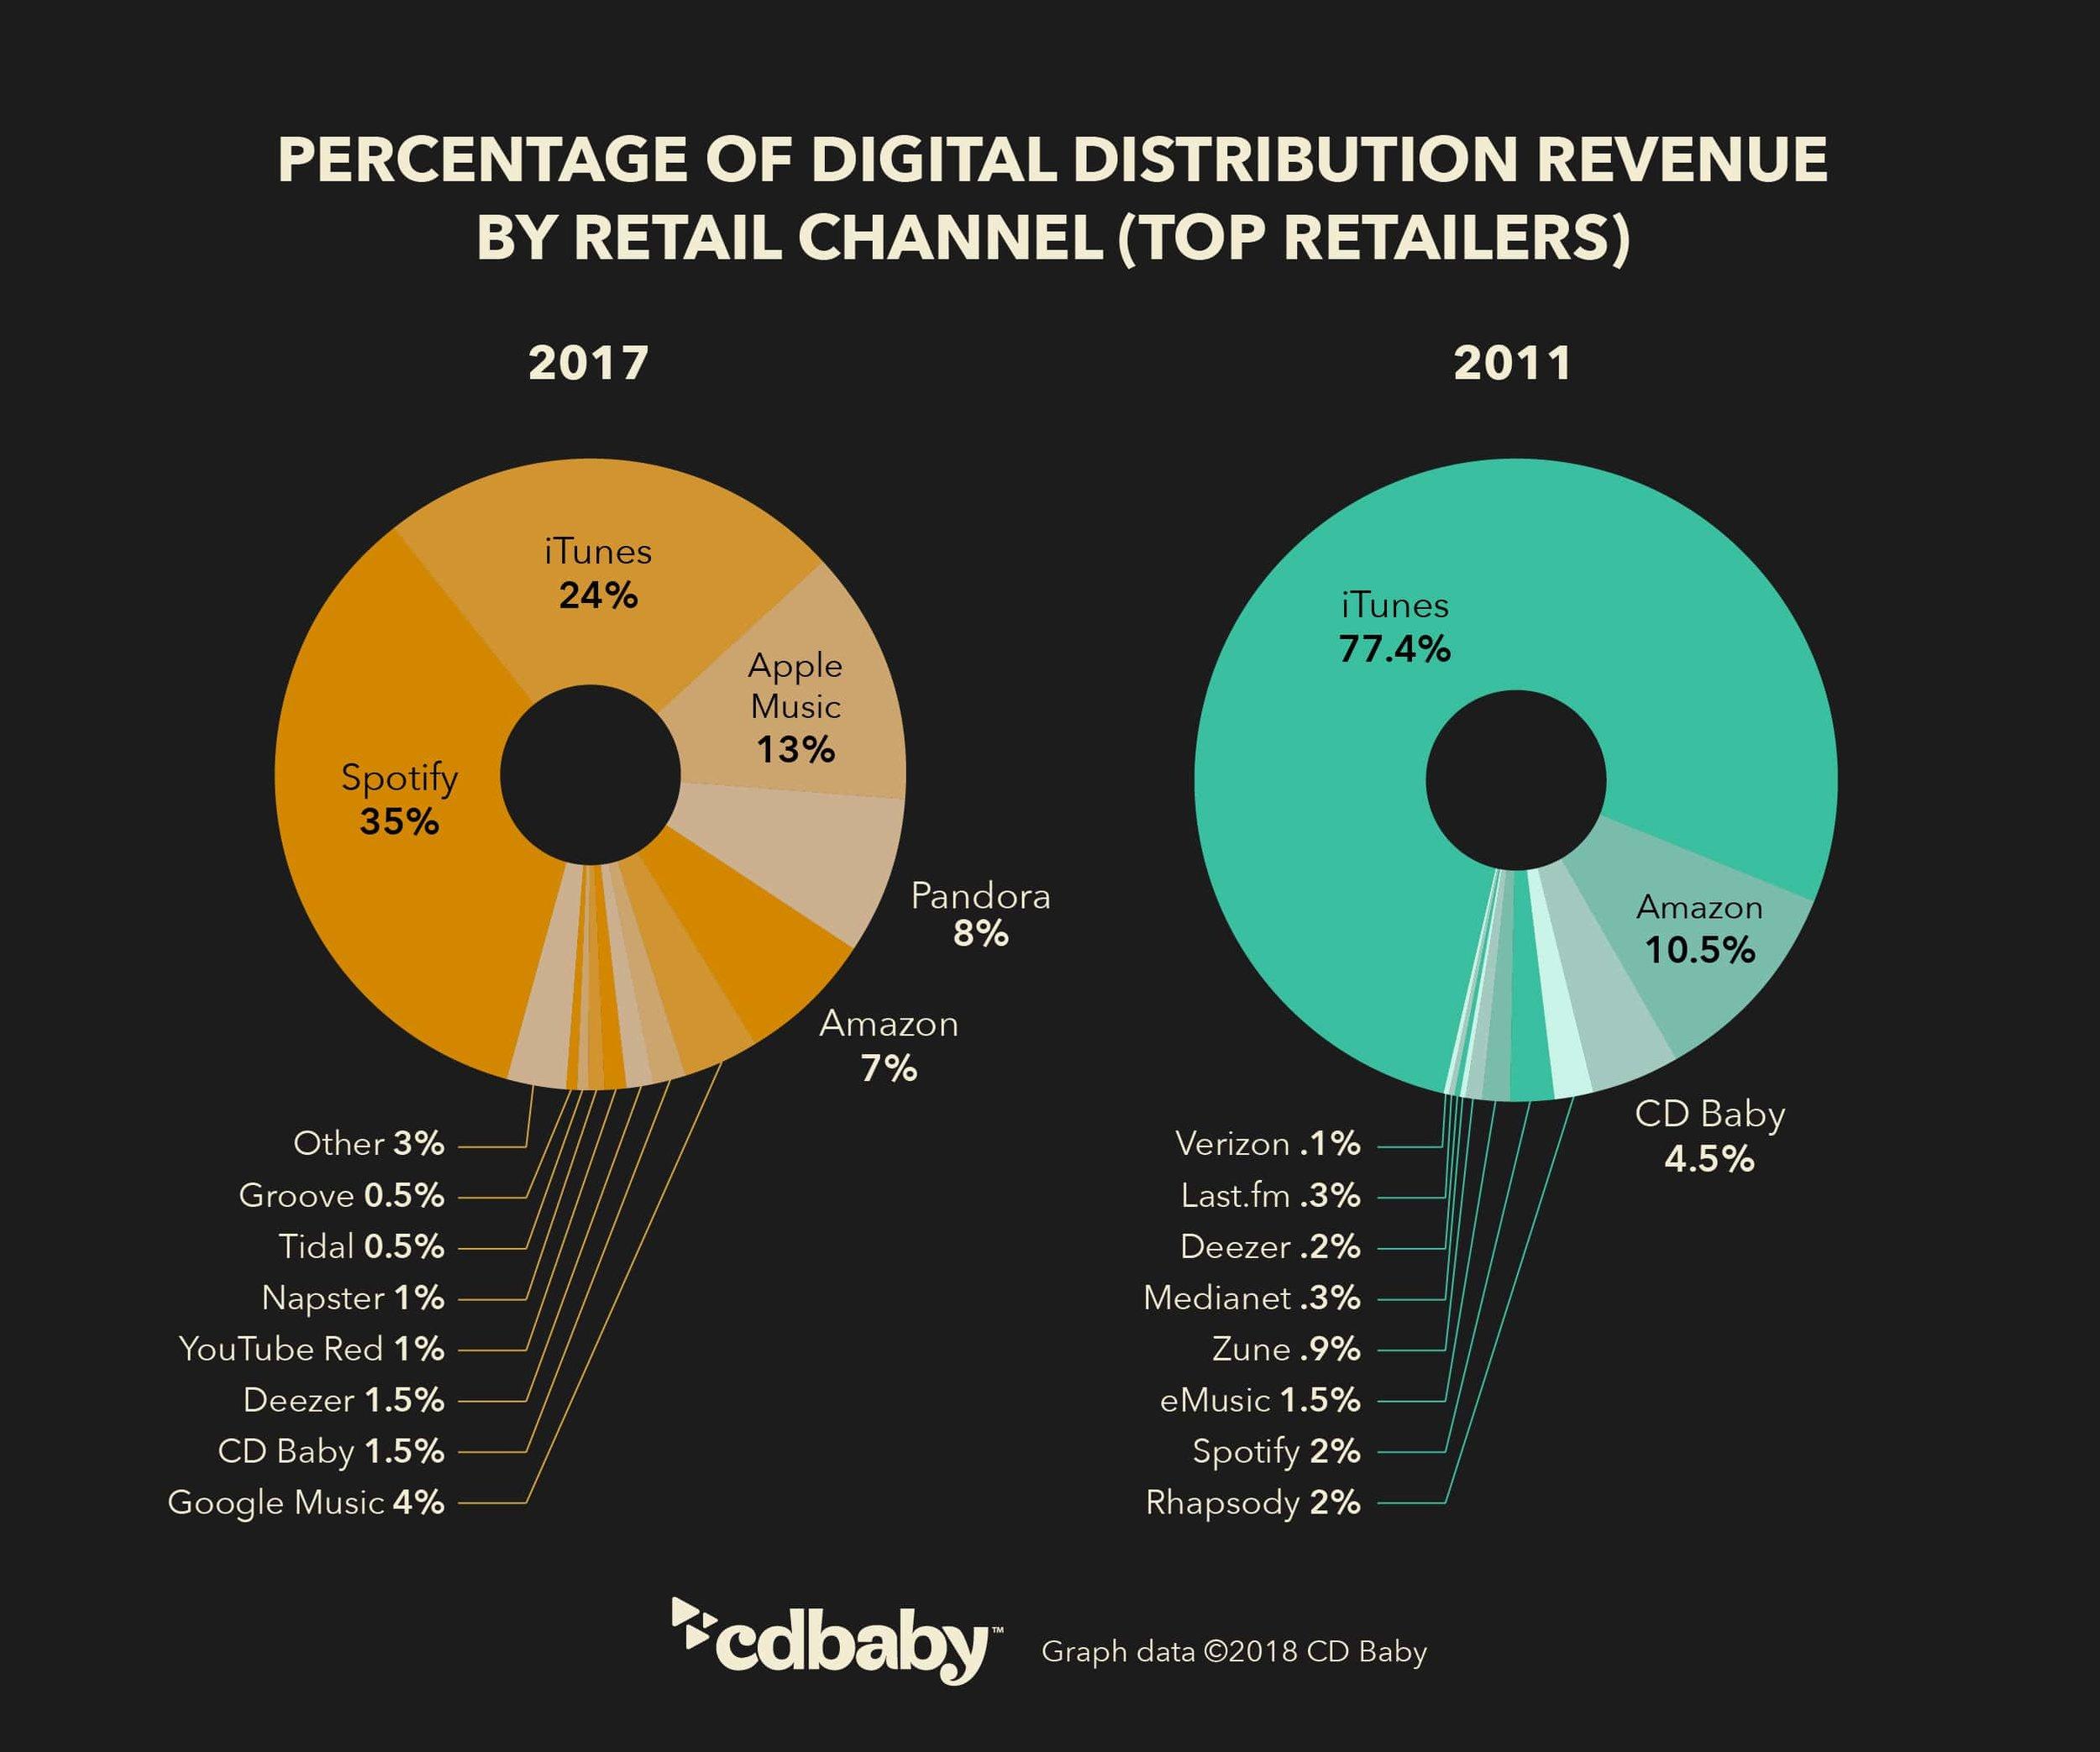 cdbb-infographic-revenue-breakout-digital-distribution-2011to2017.jpg